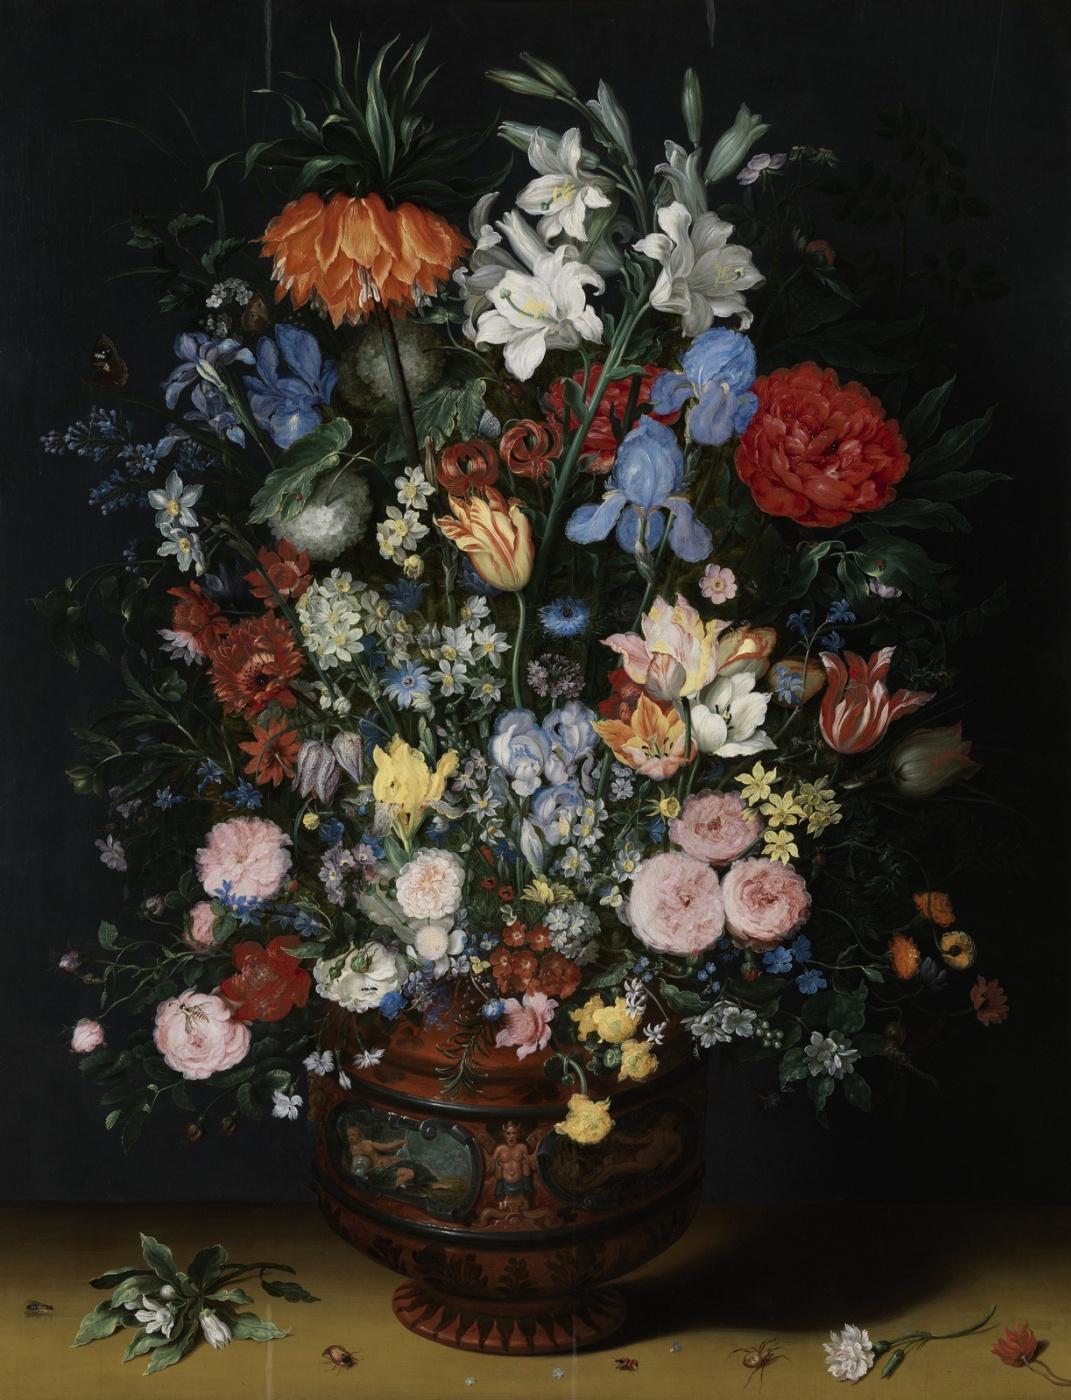 Jan Bruegel The Elder. Flowers in a terracotta vase.